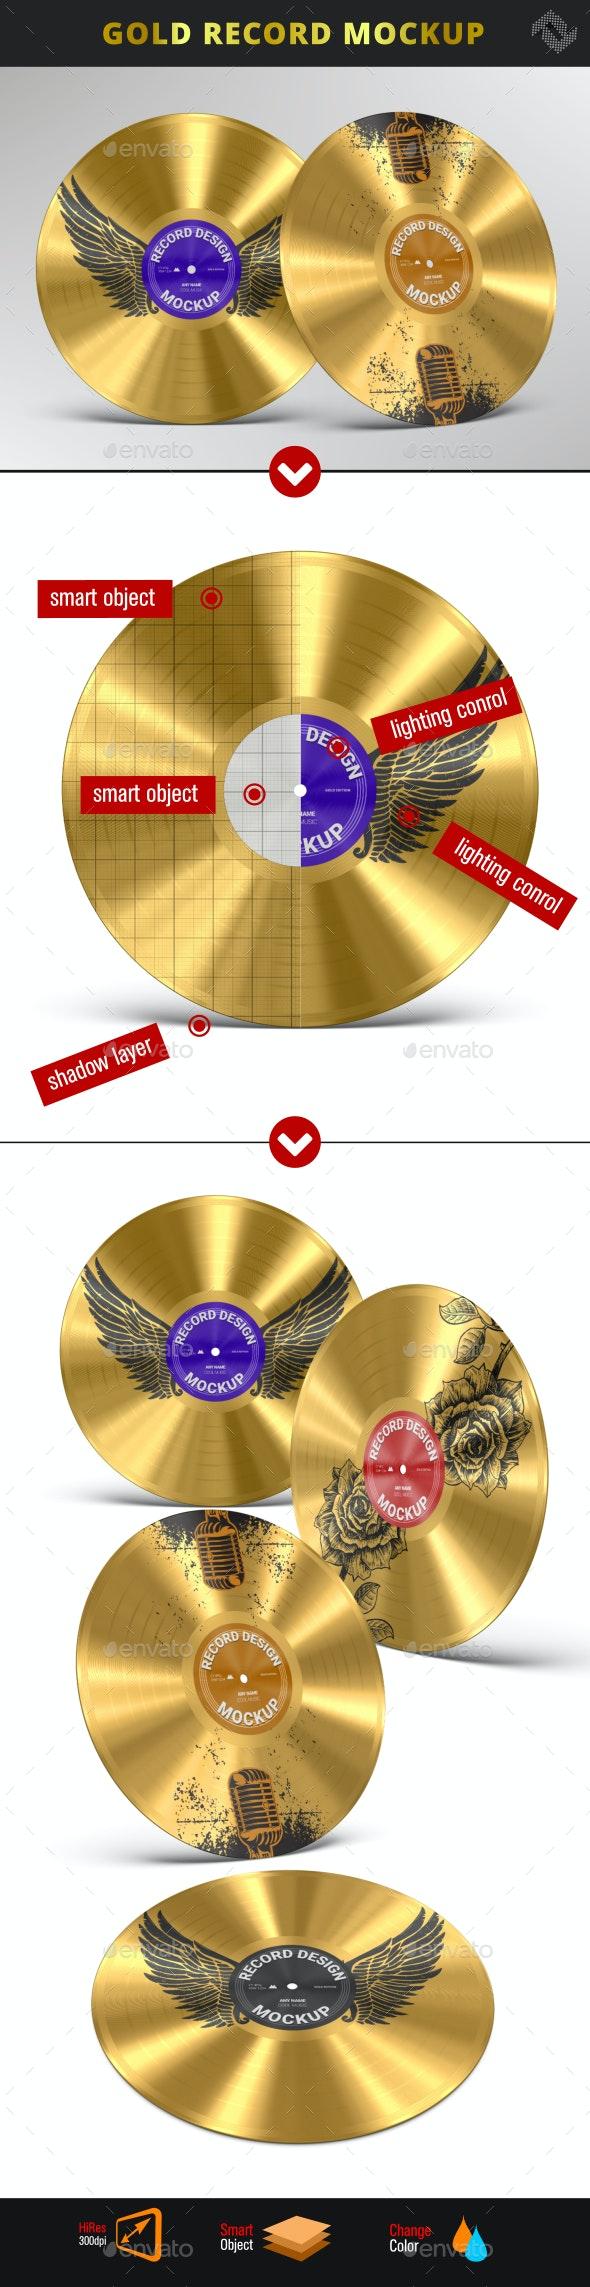 Gold Record Music Disc Award Mockup - Product Mock-Ups Graphics